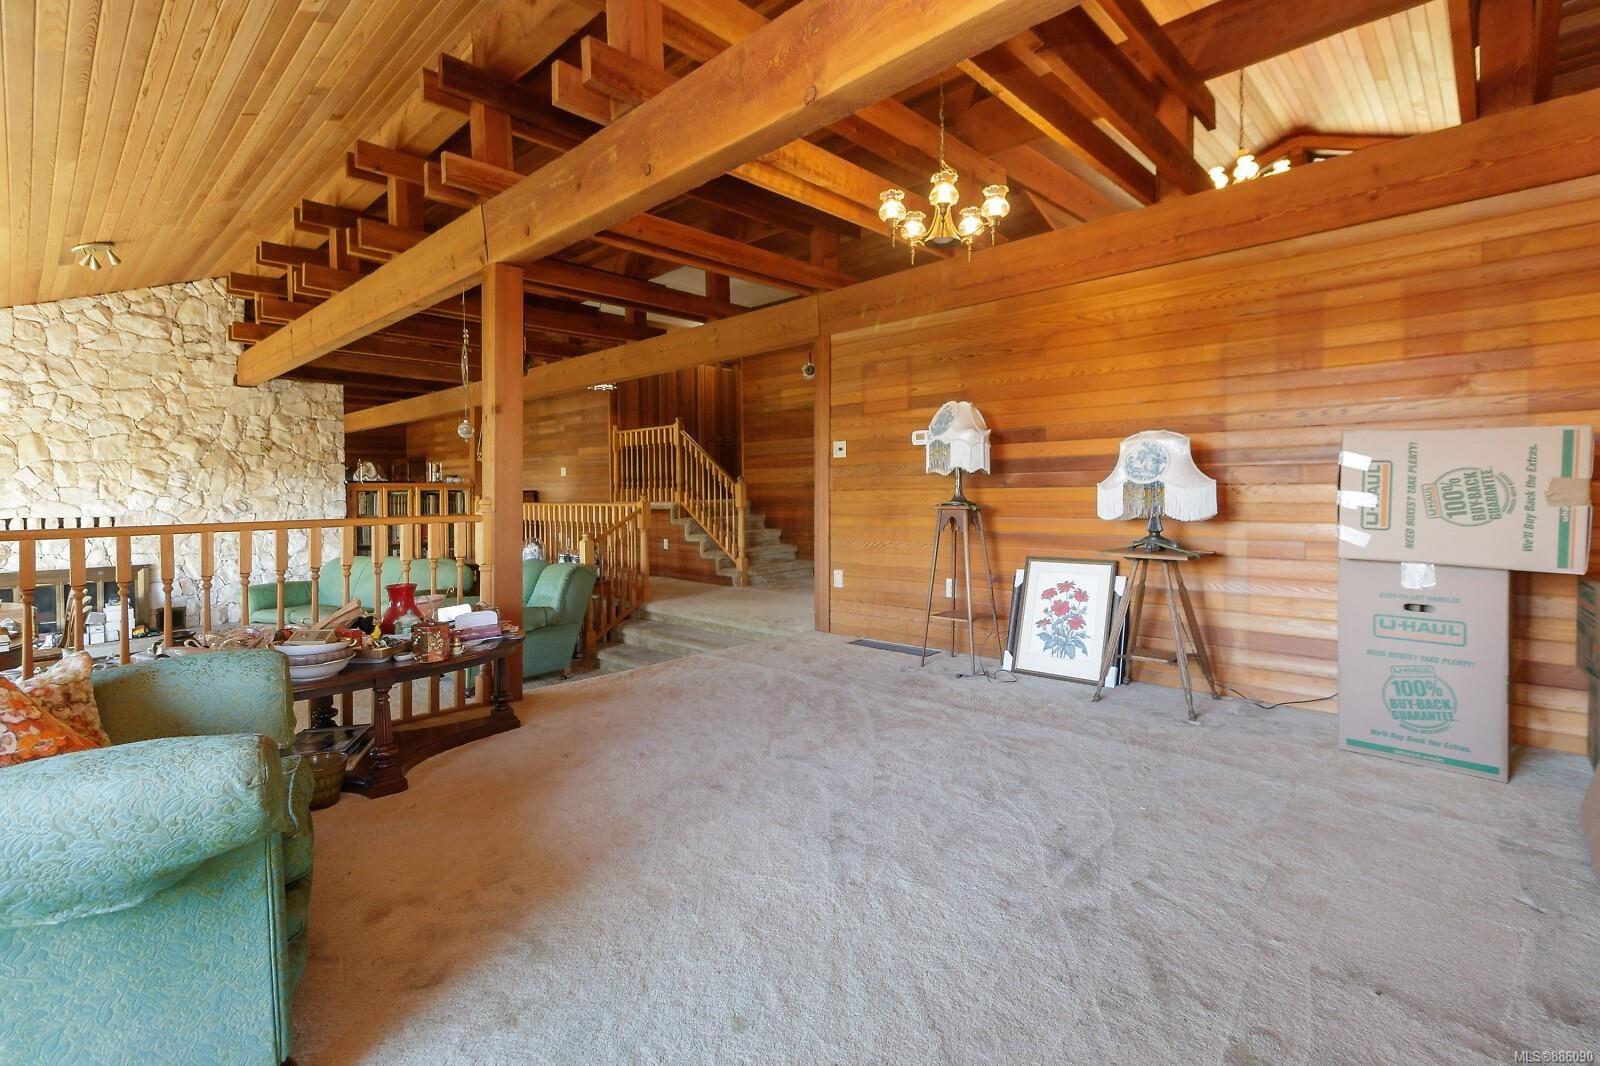 Photo 10: Photos: 4553 Blenkinsop Rd in : SE Blenkinsop House for sale (Saanich East)  : MLS®# 886090